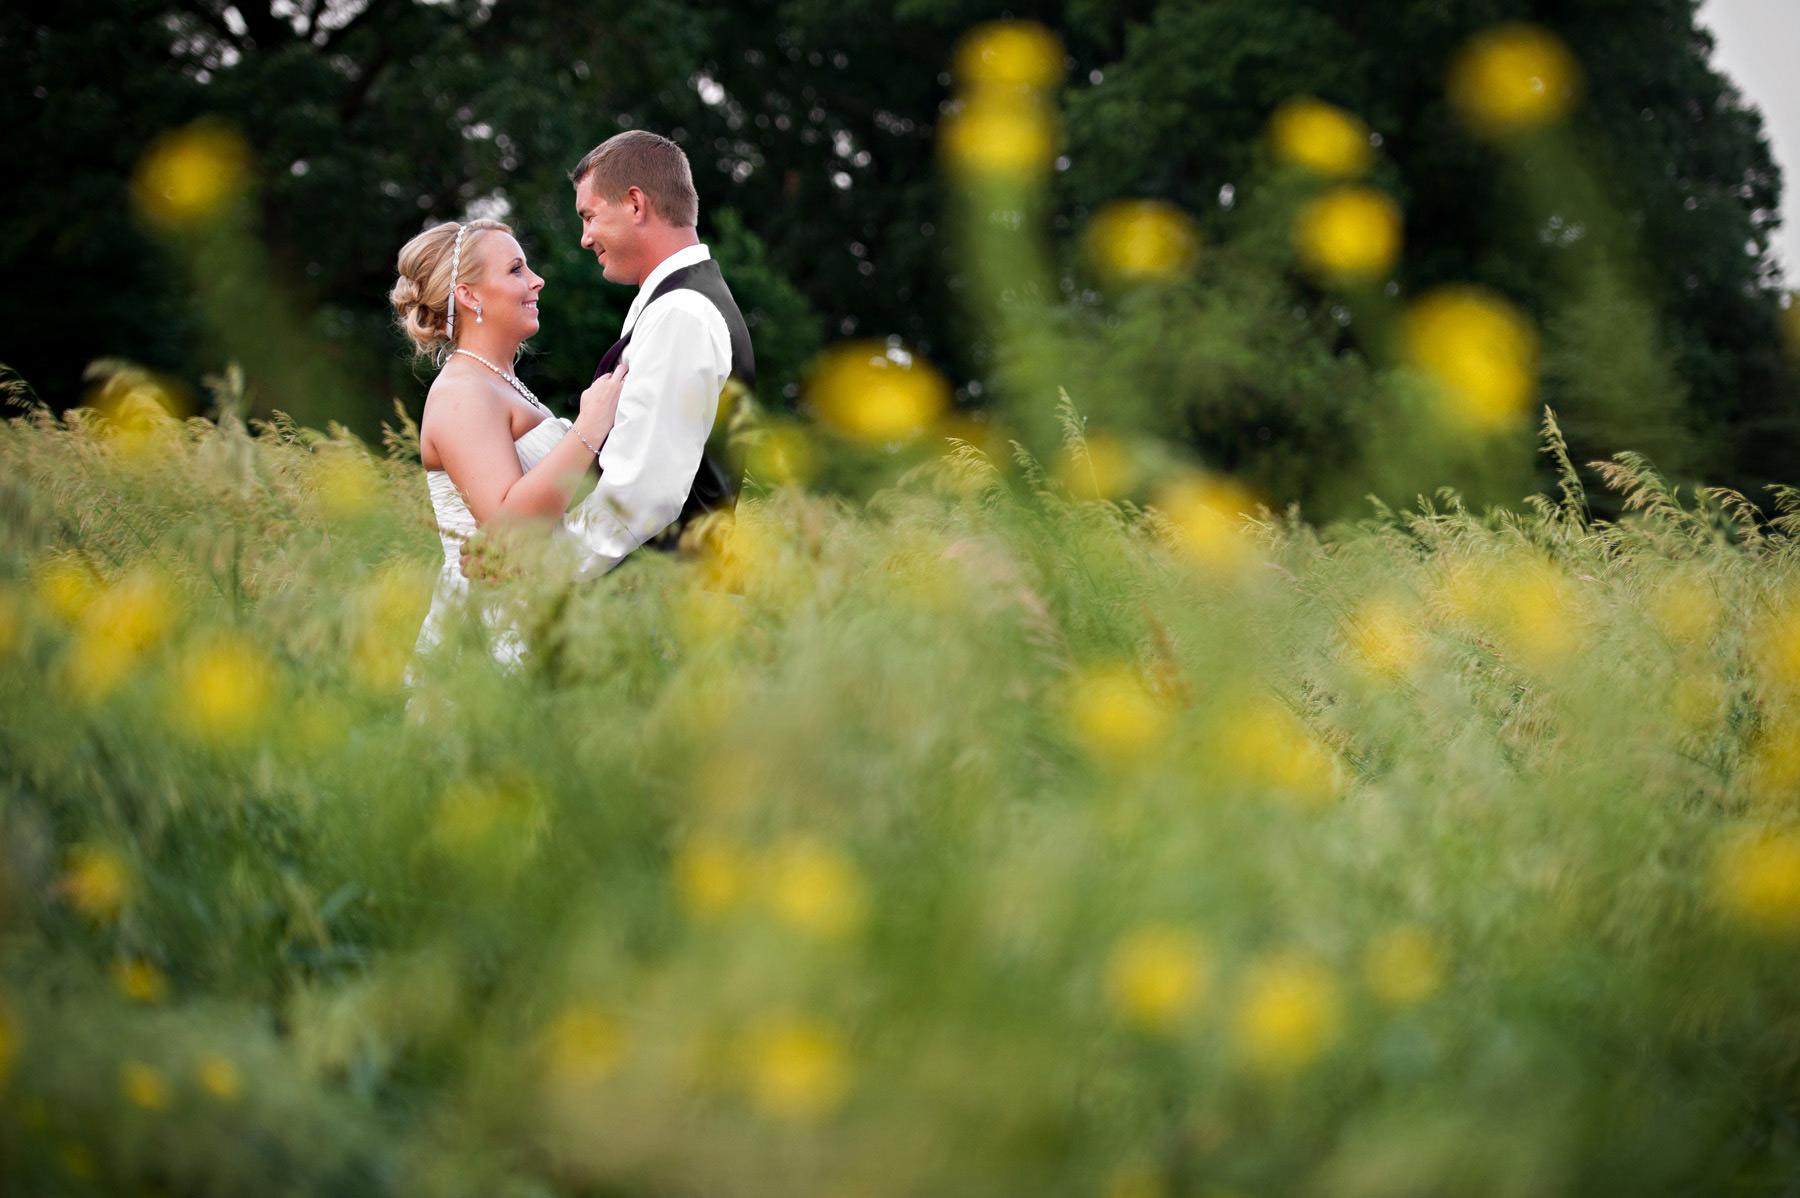 minnesota-wedding-photographers-mark-kegans-934.jpg